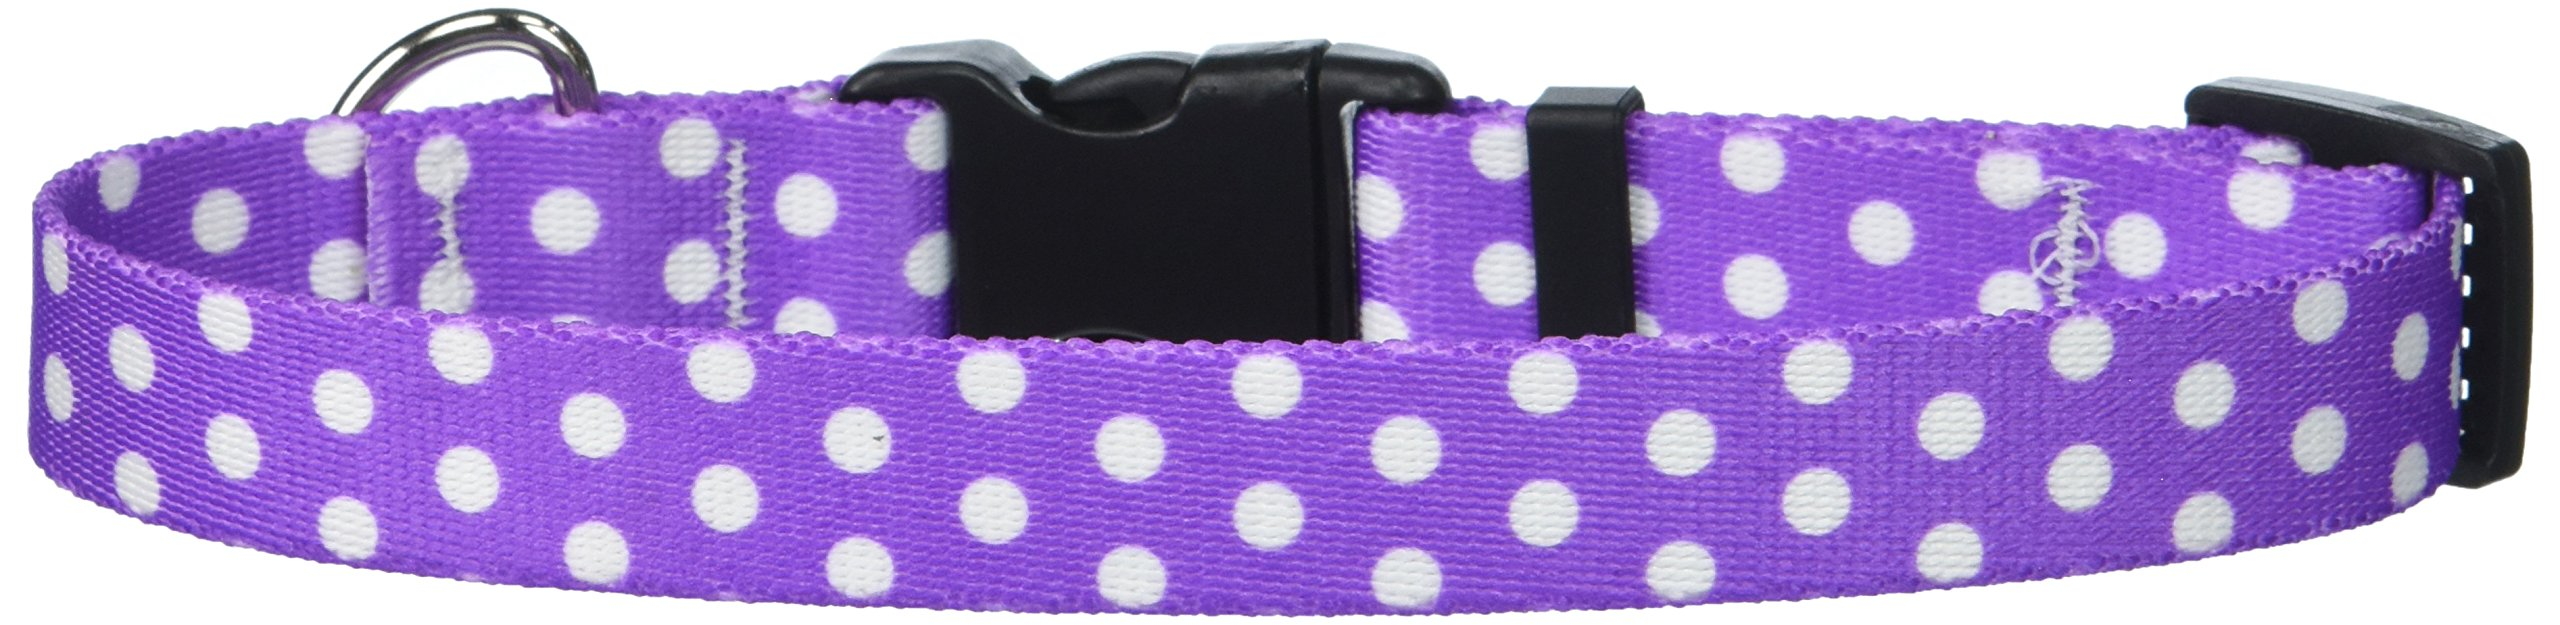 Yellow Dog Design Standard Easy-Snap Collar, New Purple Polka Dot, Small 10'' - 14'' by Yellow Dog Design